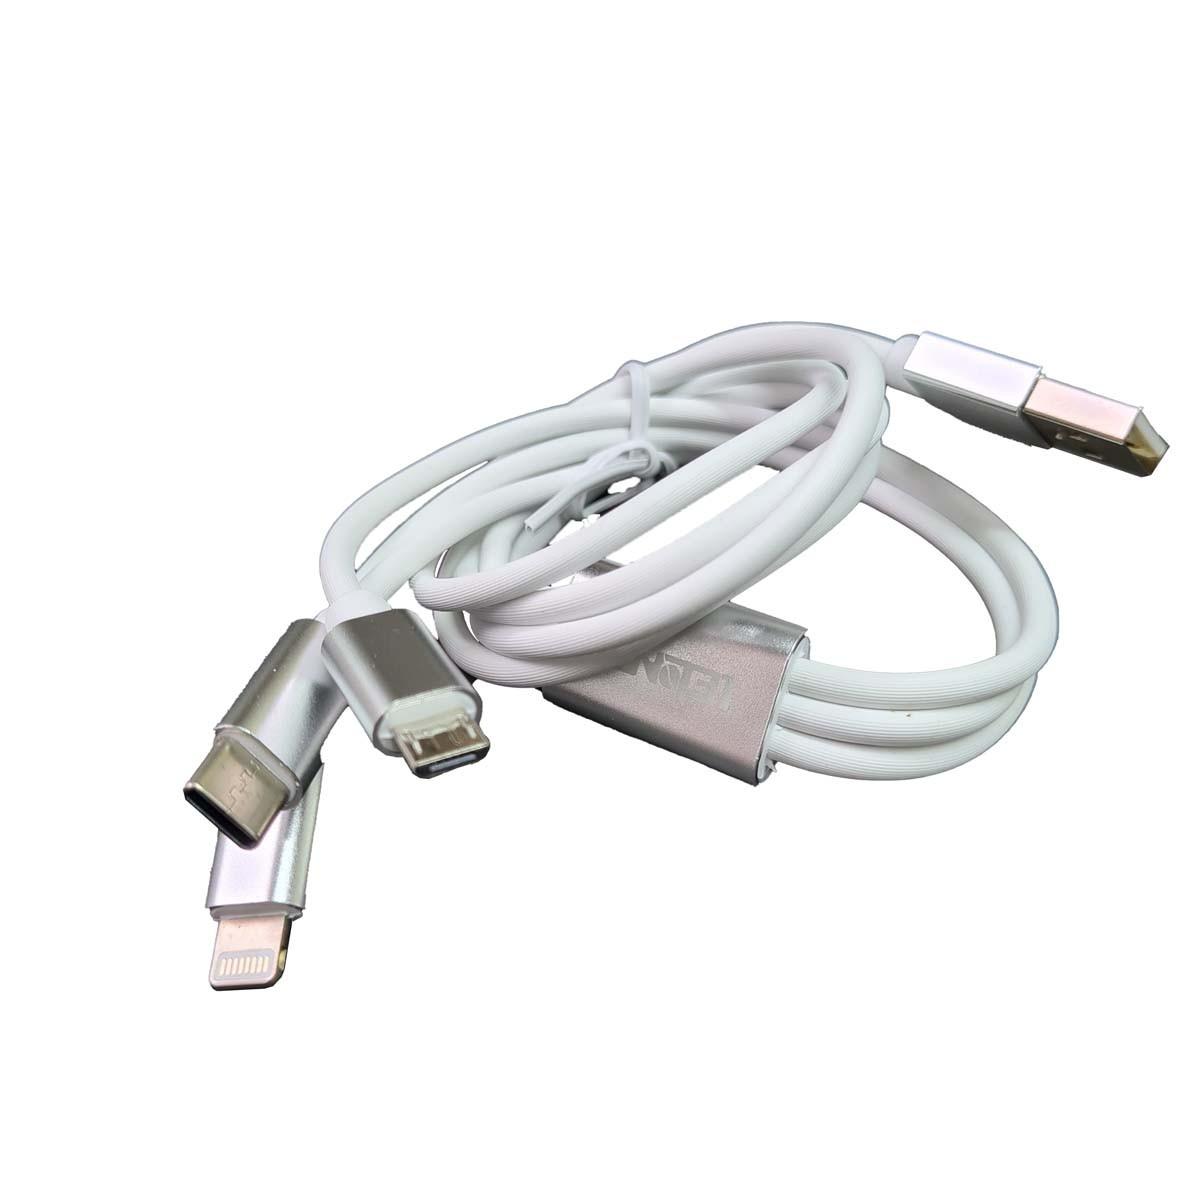 Cabo carregador USB 3 em 1 Lighting Tipo C e V8 1metro Lelong LE-835